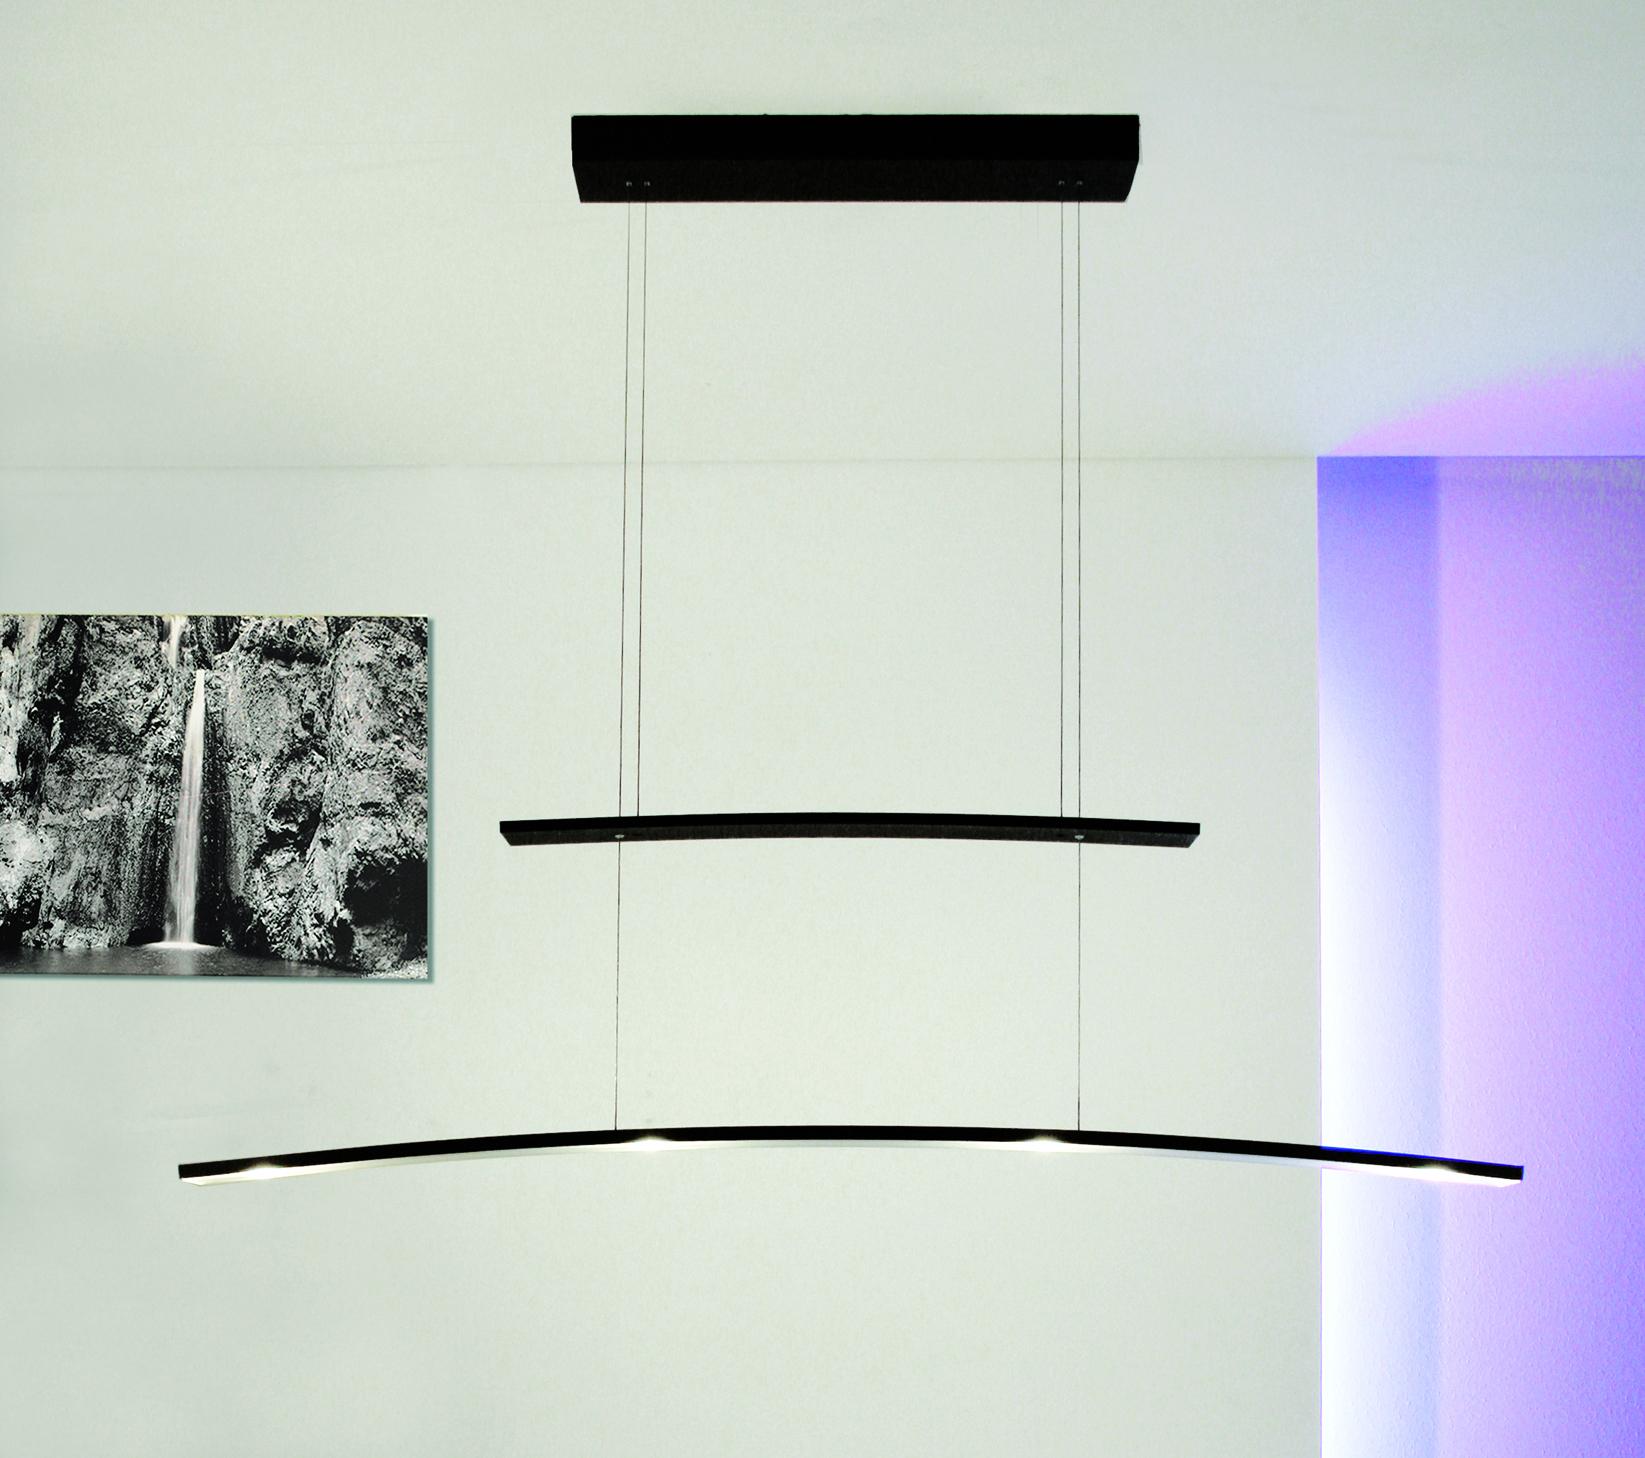 bopp arco led h ngeleuchte 4 flammig dimmbar 28090409 leuchtenking. Black Bedroom Furniture Sets. Home Design Ideas